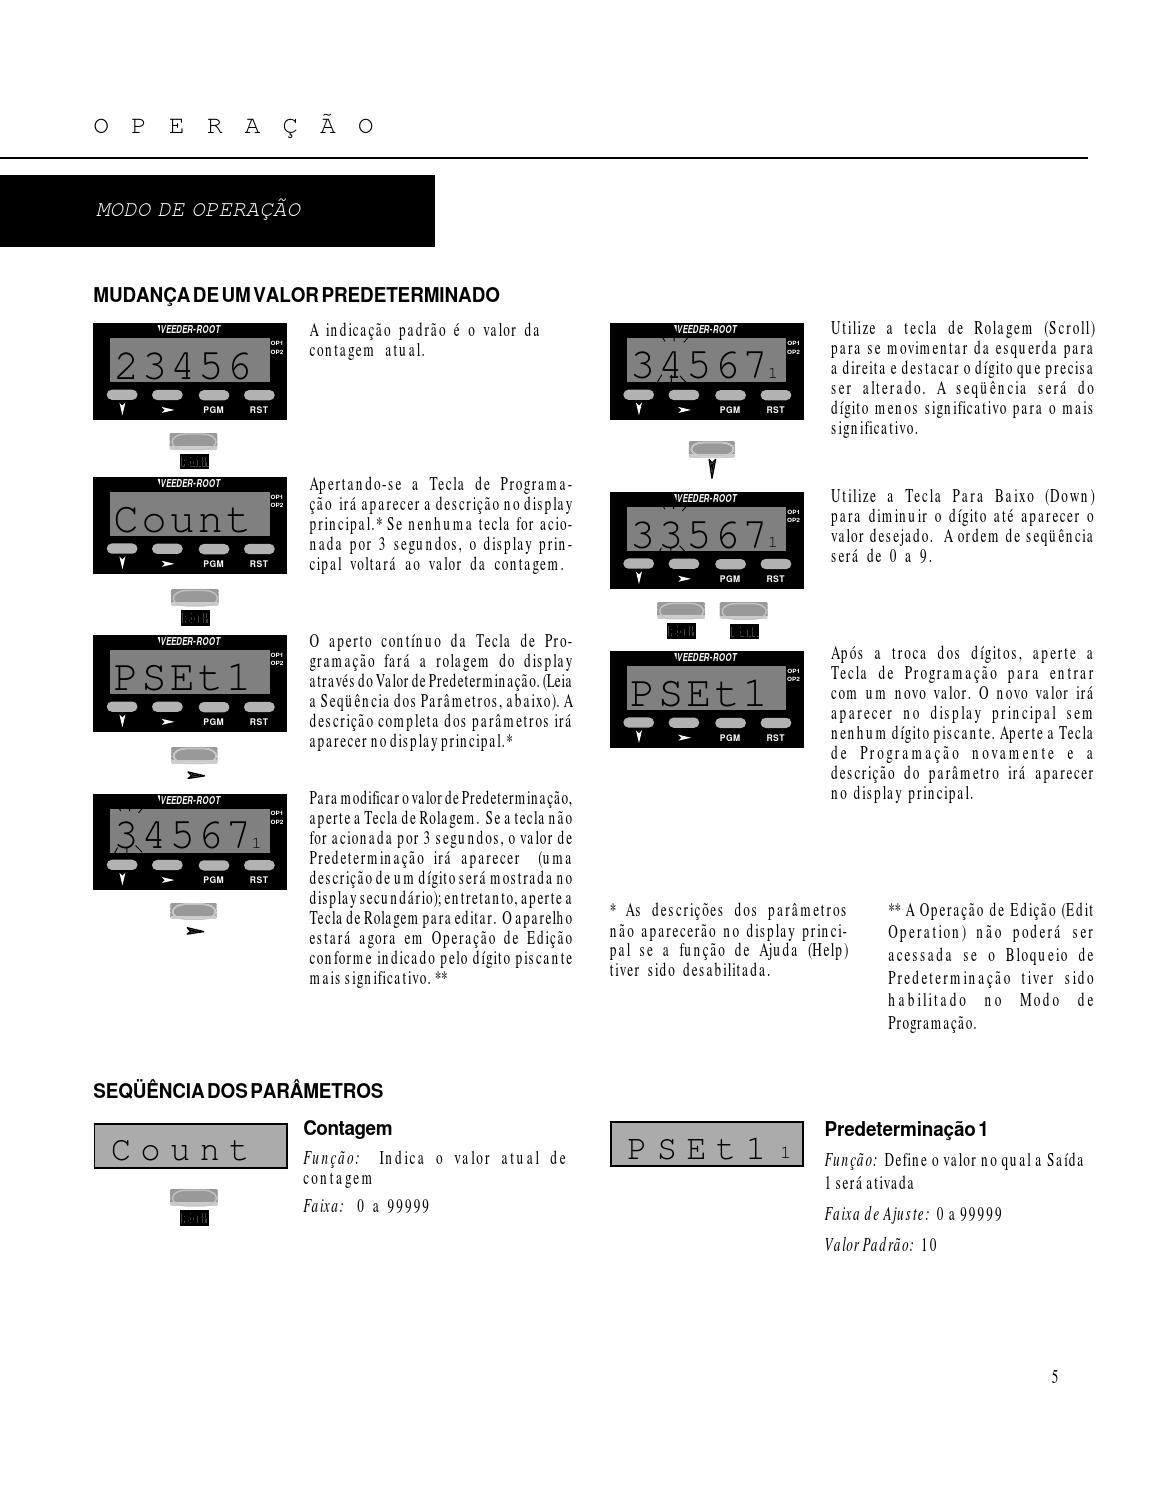 Contador c628 7 predeterminador manual portugues veeder